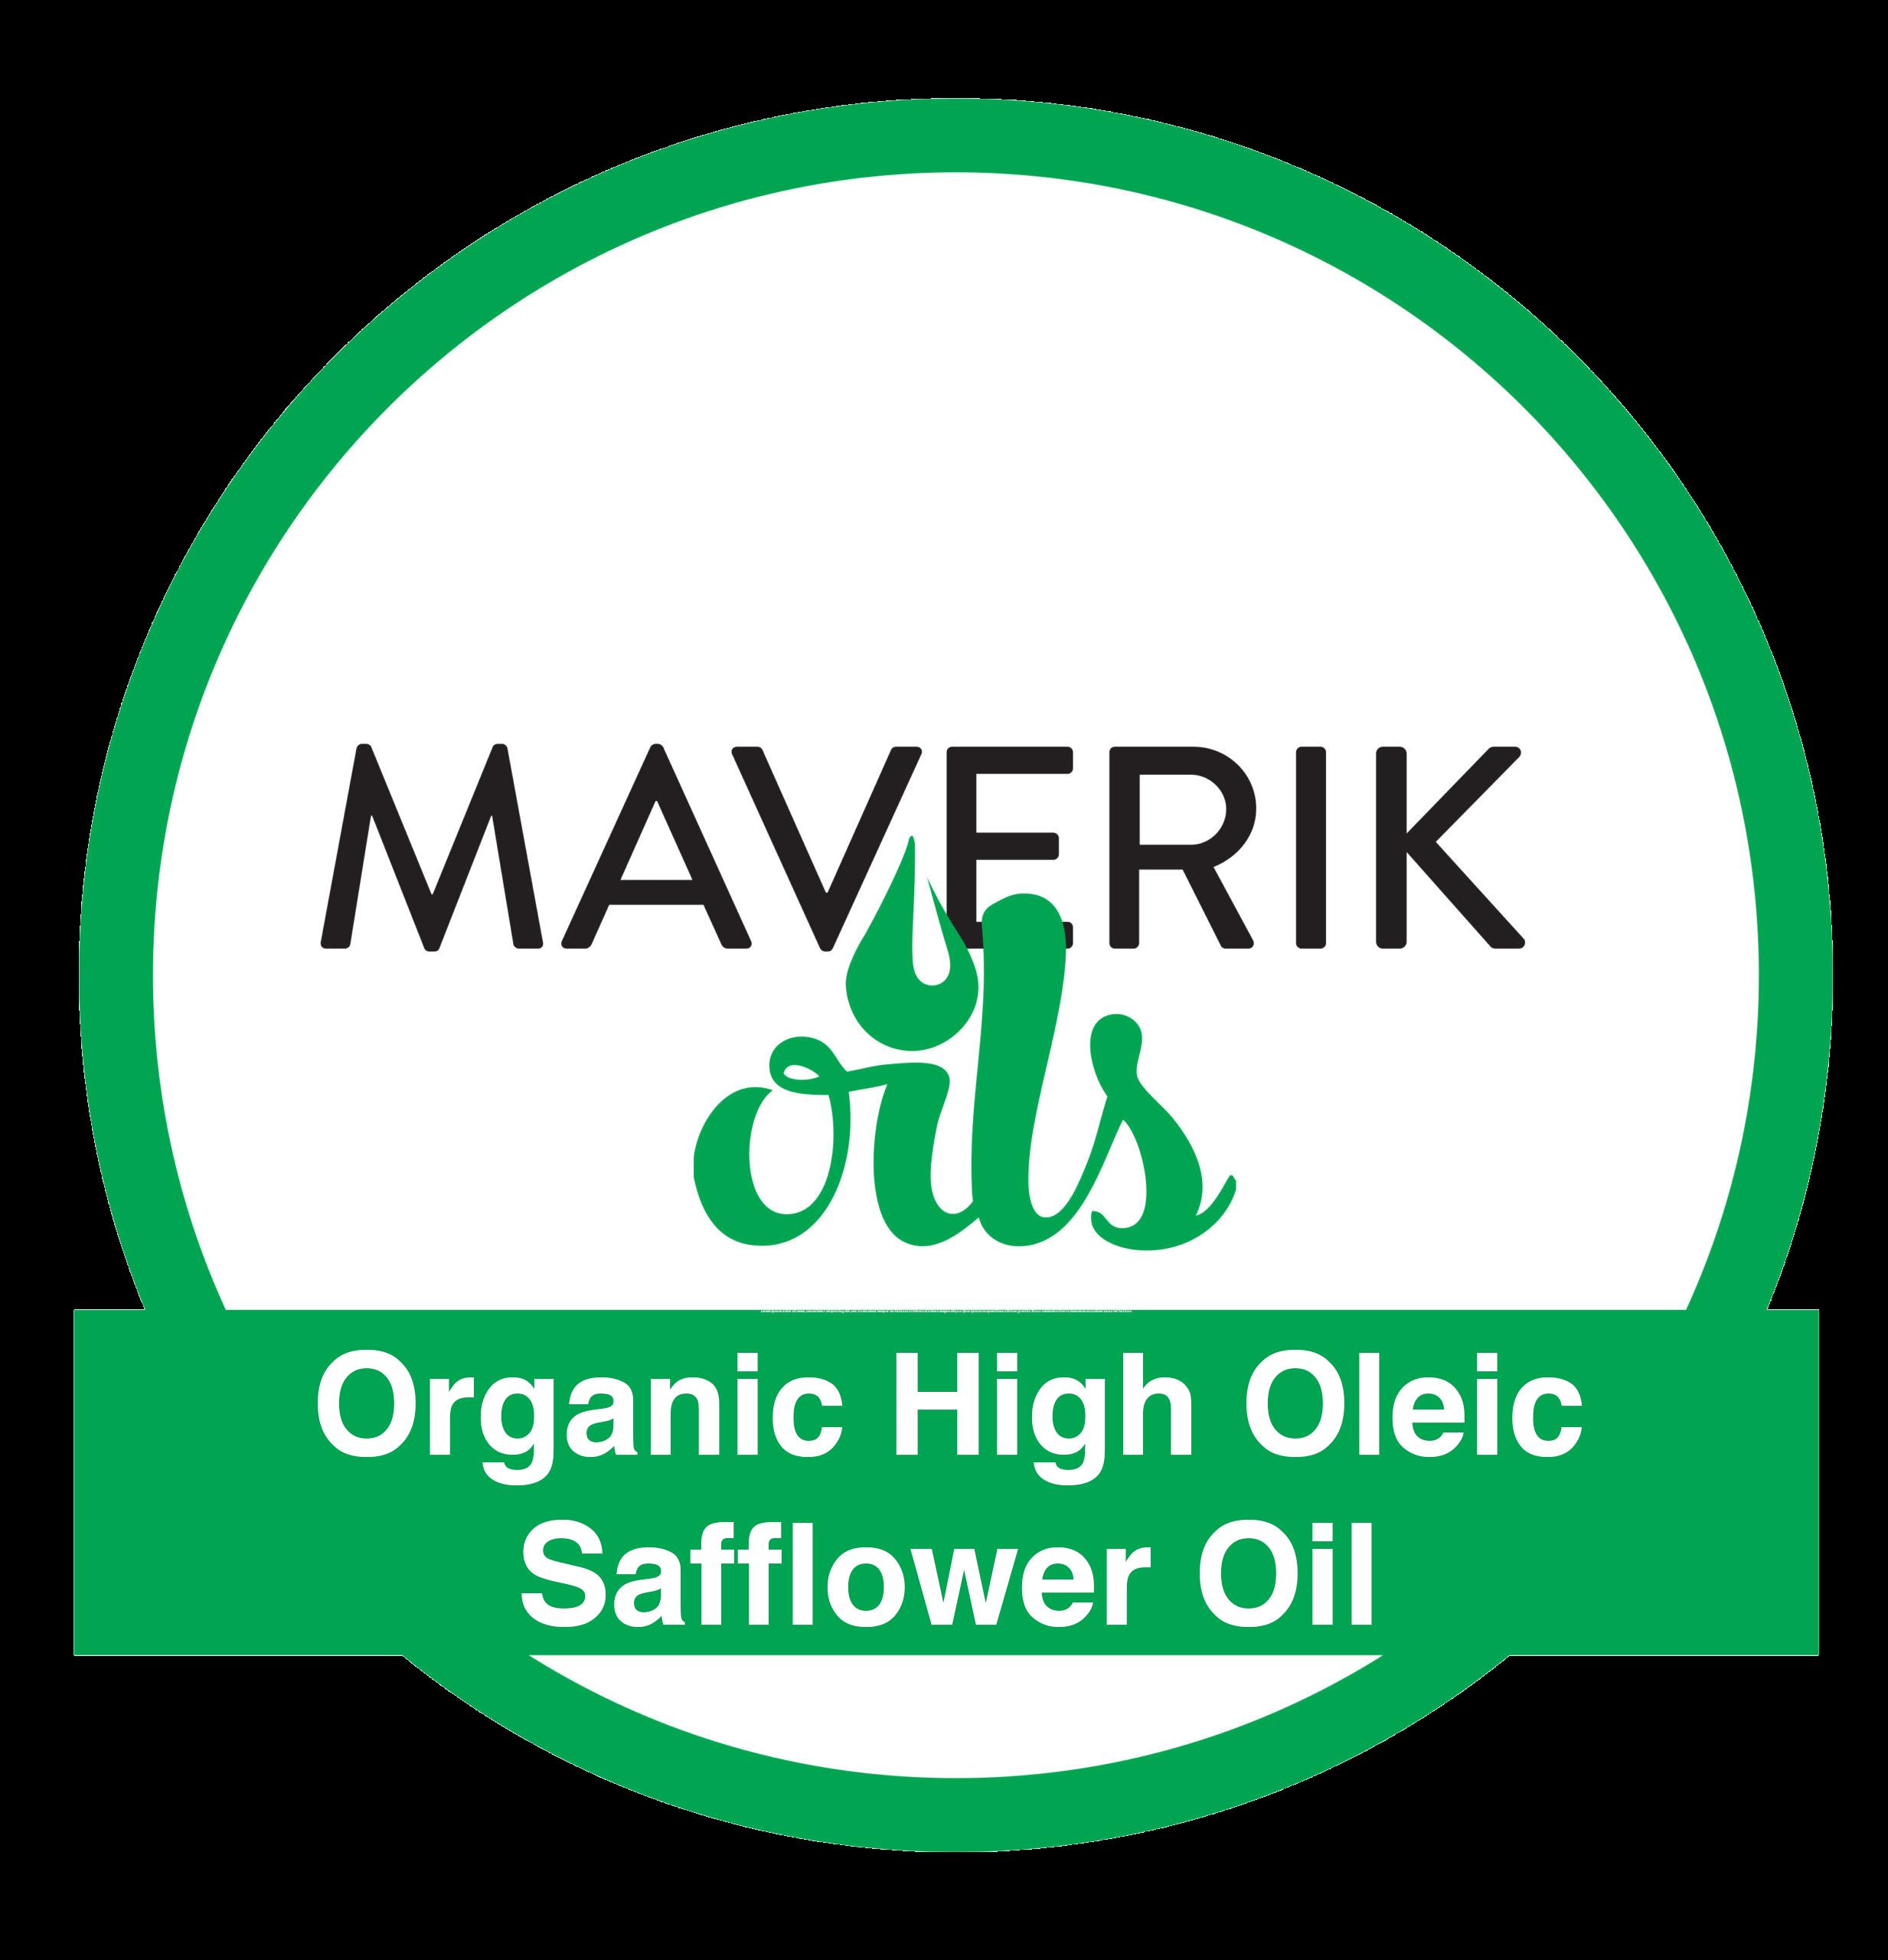 Organic High Oleic Safflower Oil